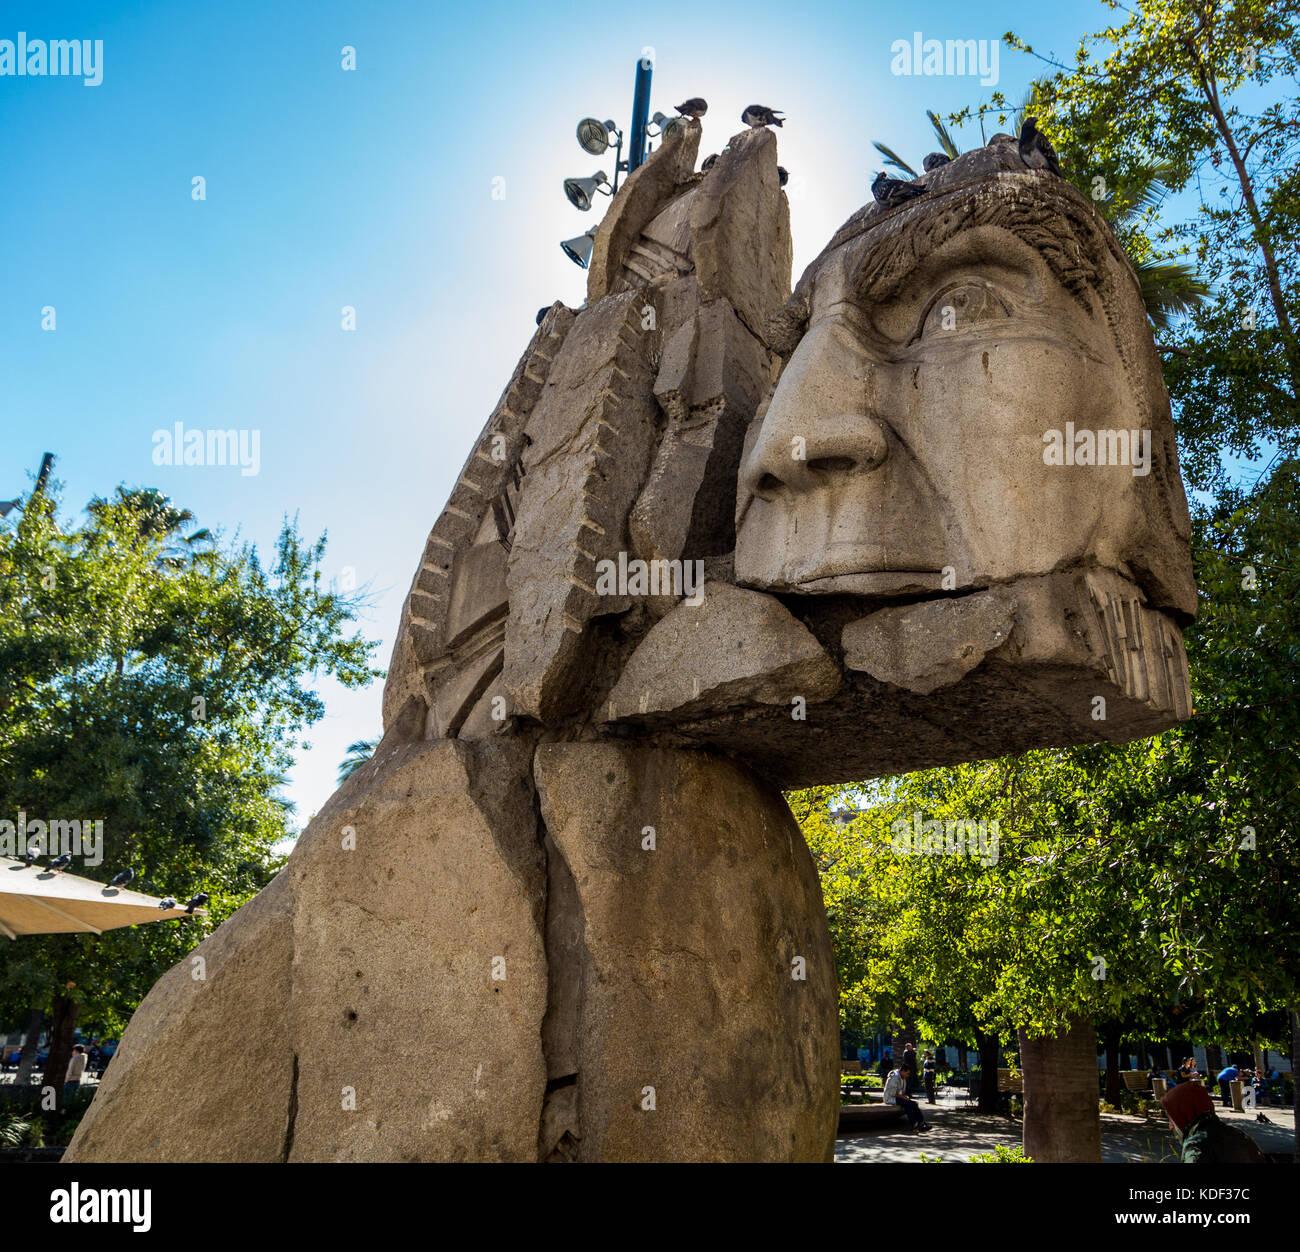 Monument to the Mapuche, Plaza de Armas, Santiago, Chile, South America - Stock Image